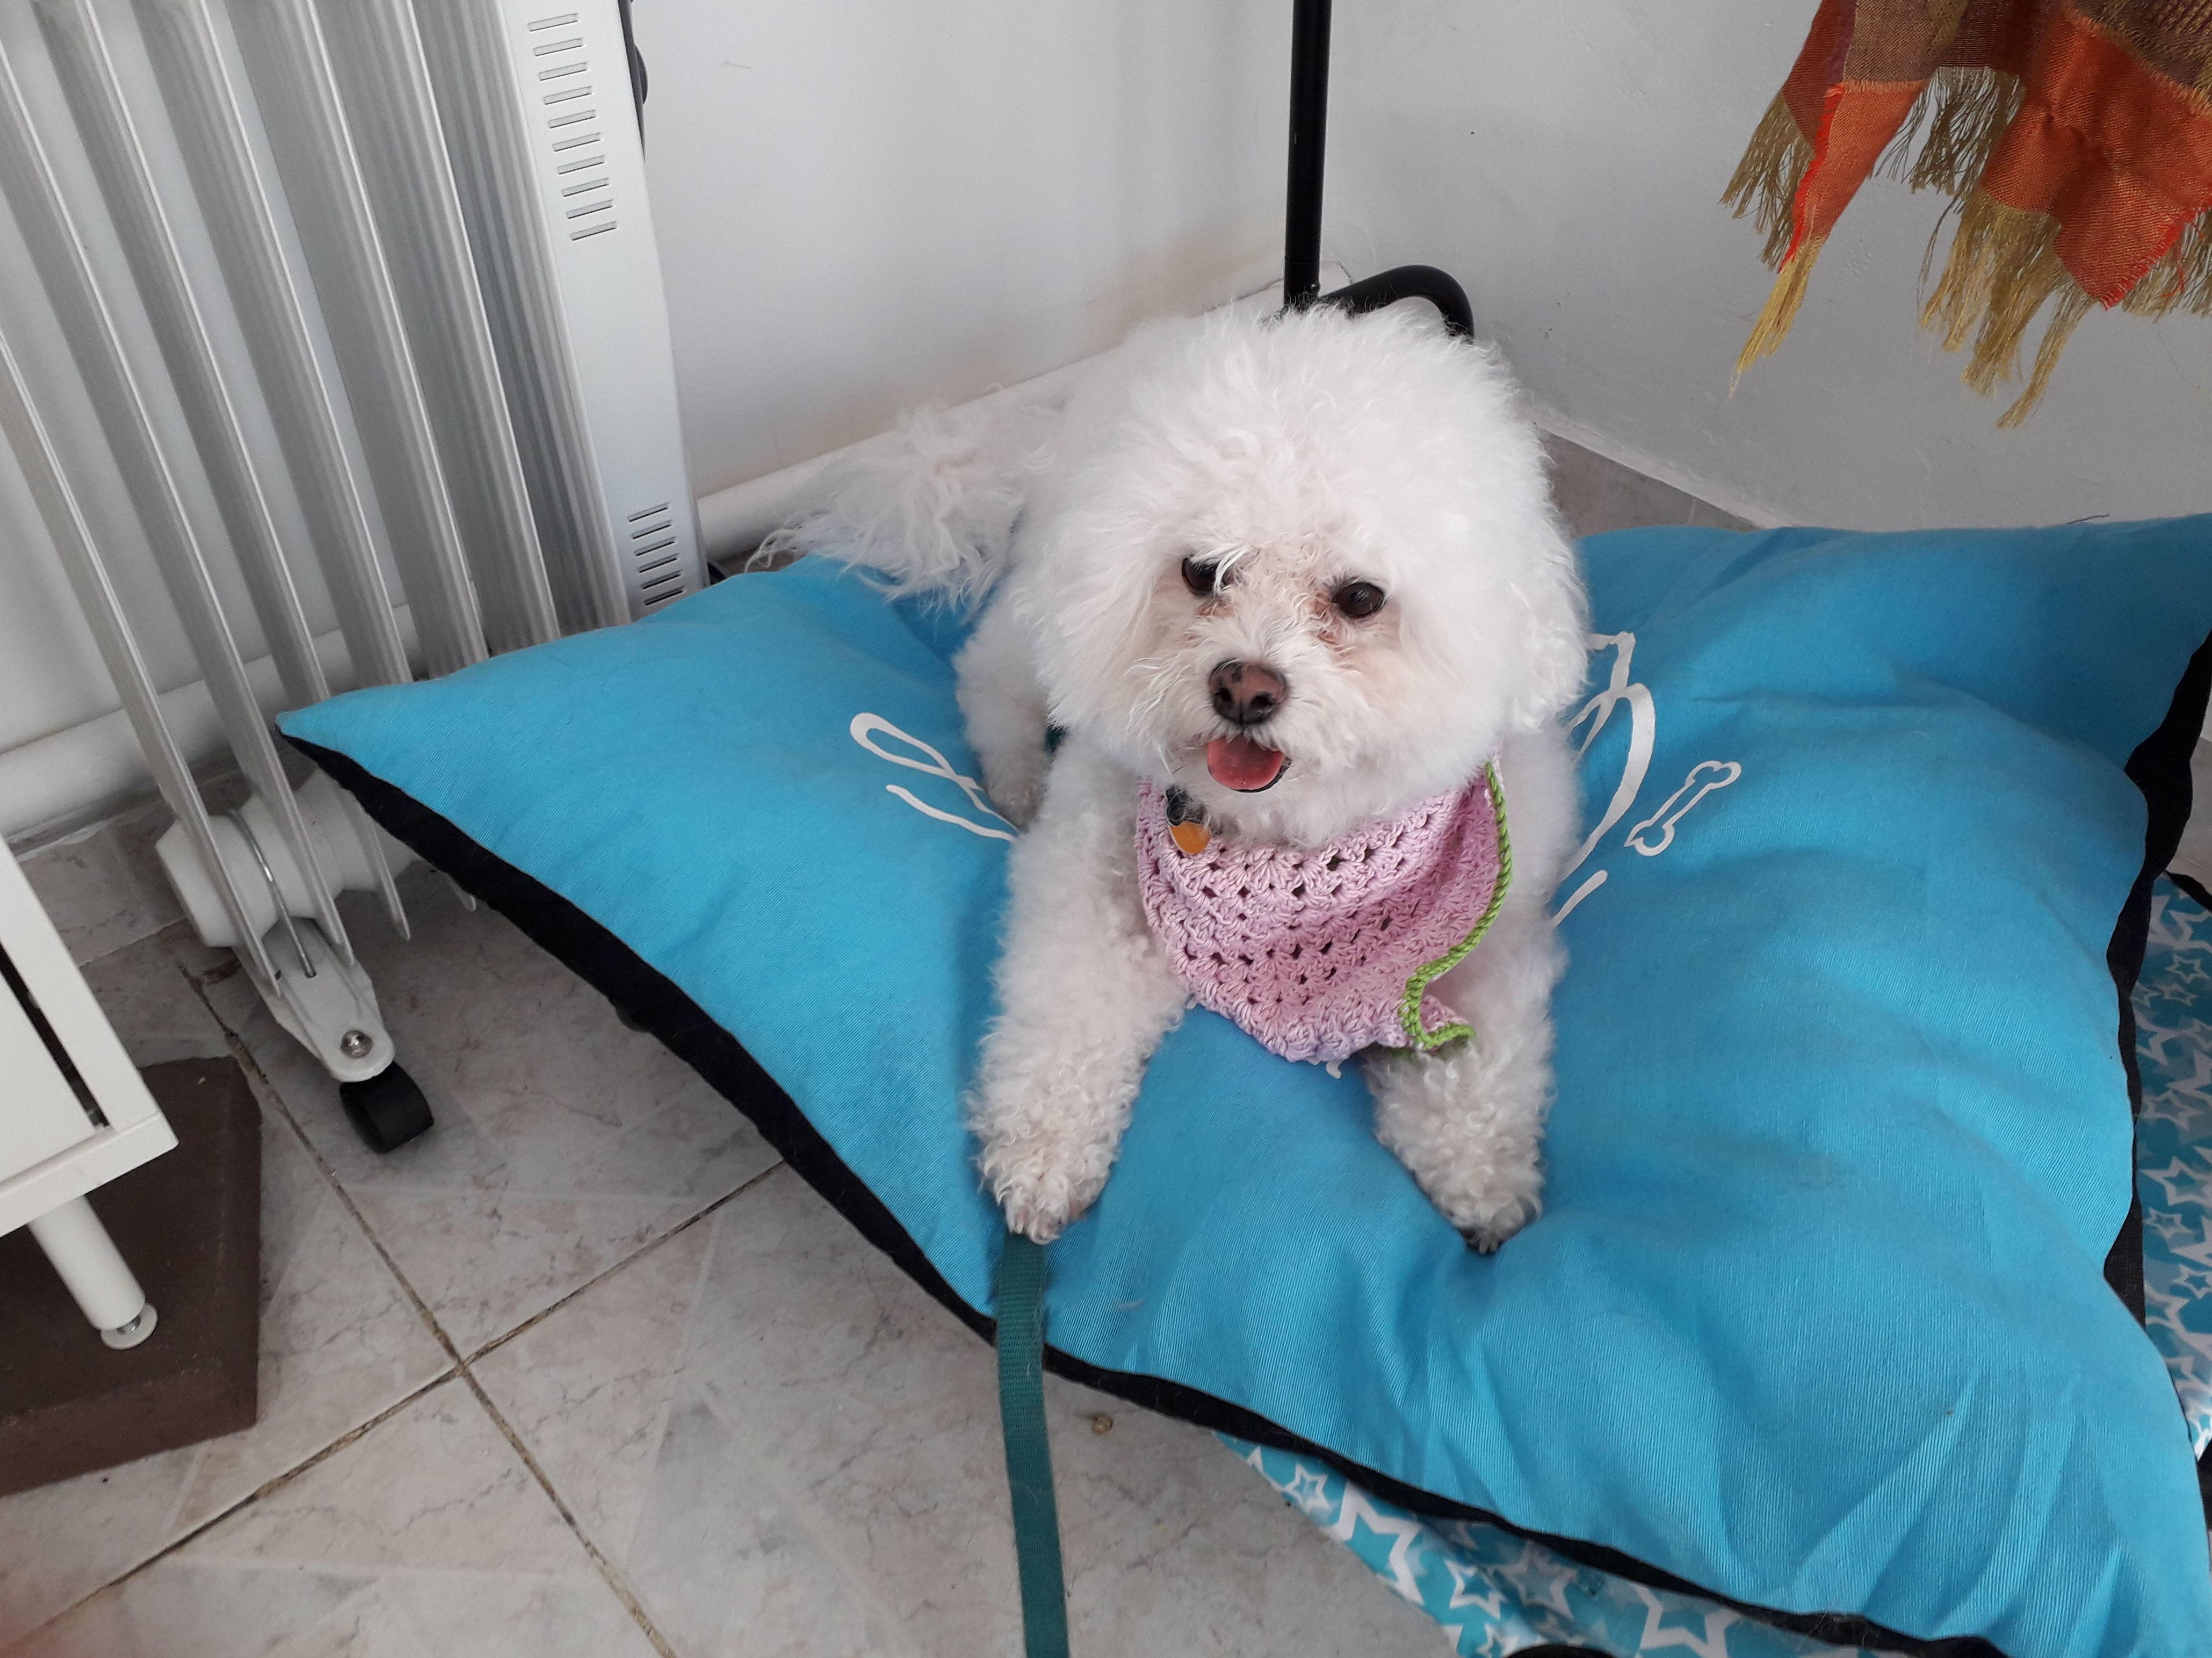 Foto 7 de Peluquería canina en  | Peludetes de Carmen